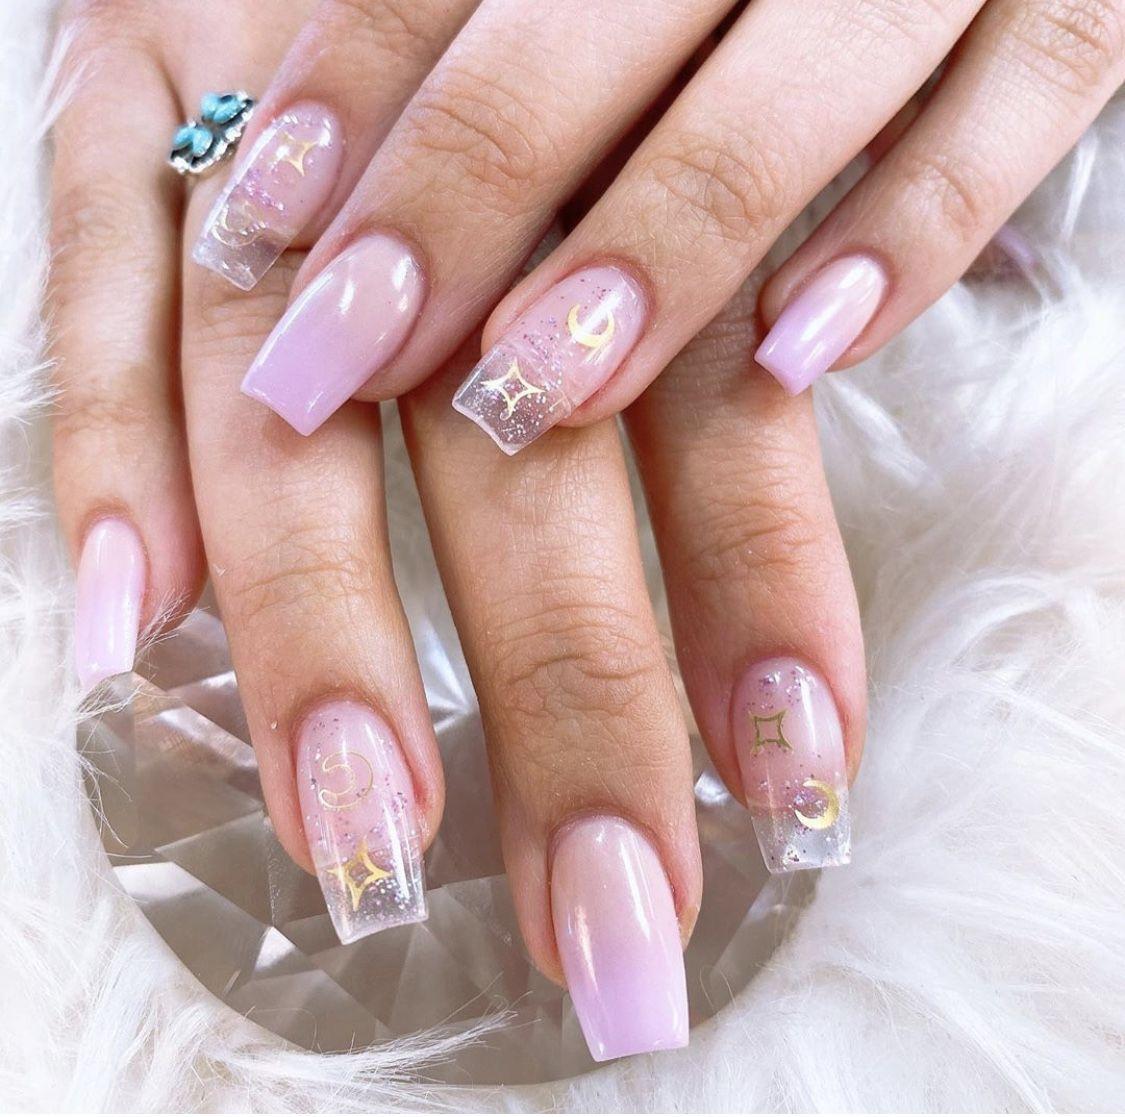 Lilac Nails Star And Moon In 2020 Lilac Nails Star Nail Designs Clear Nail Designs